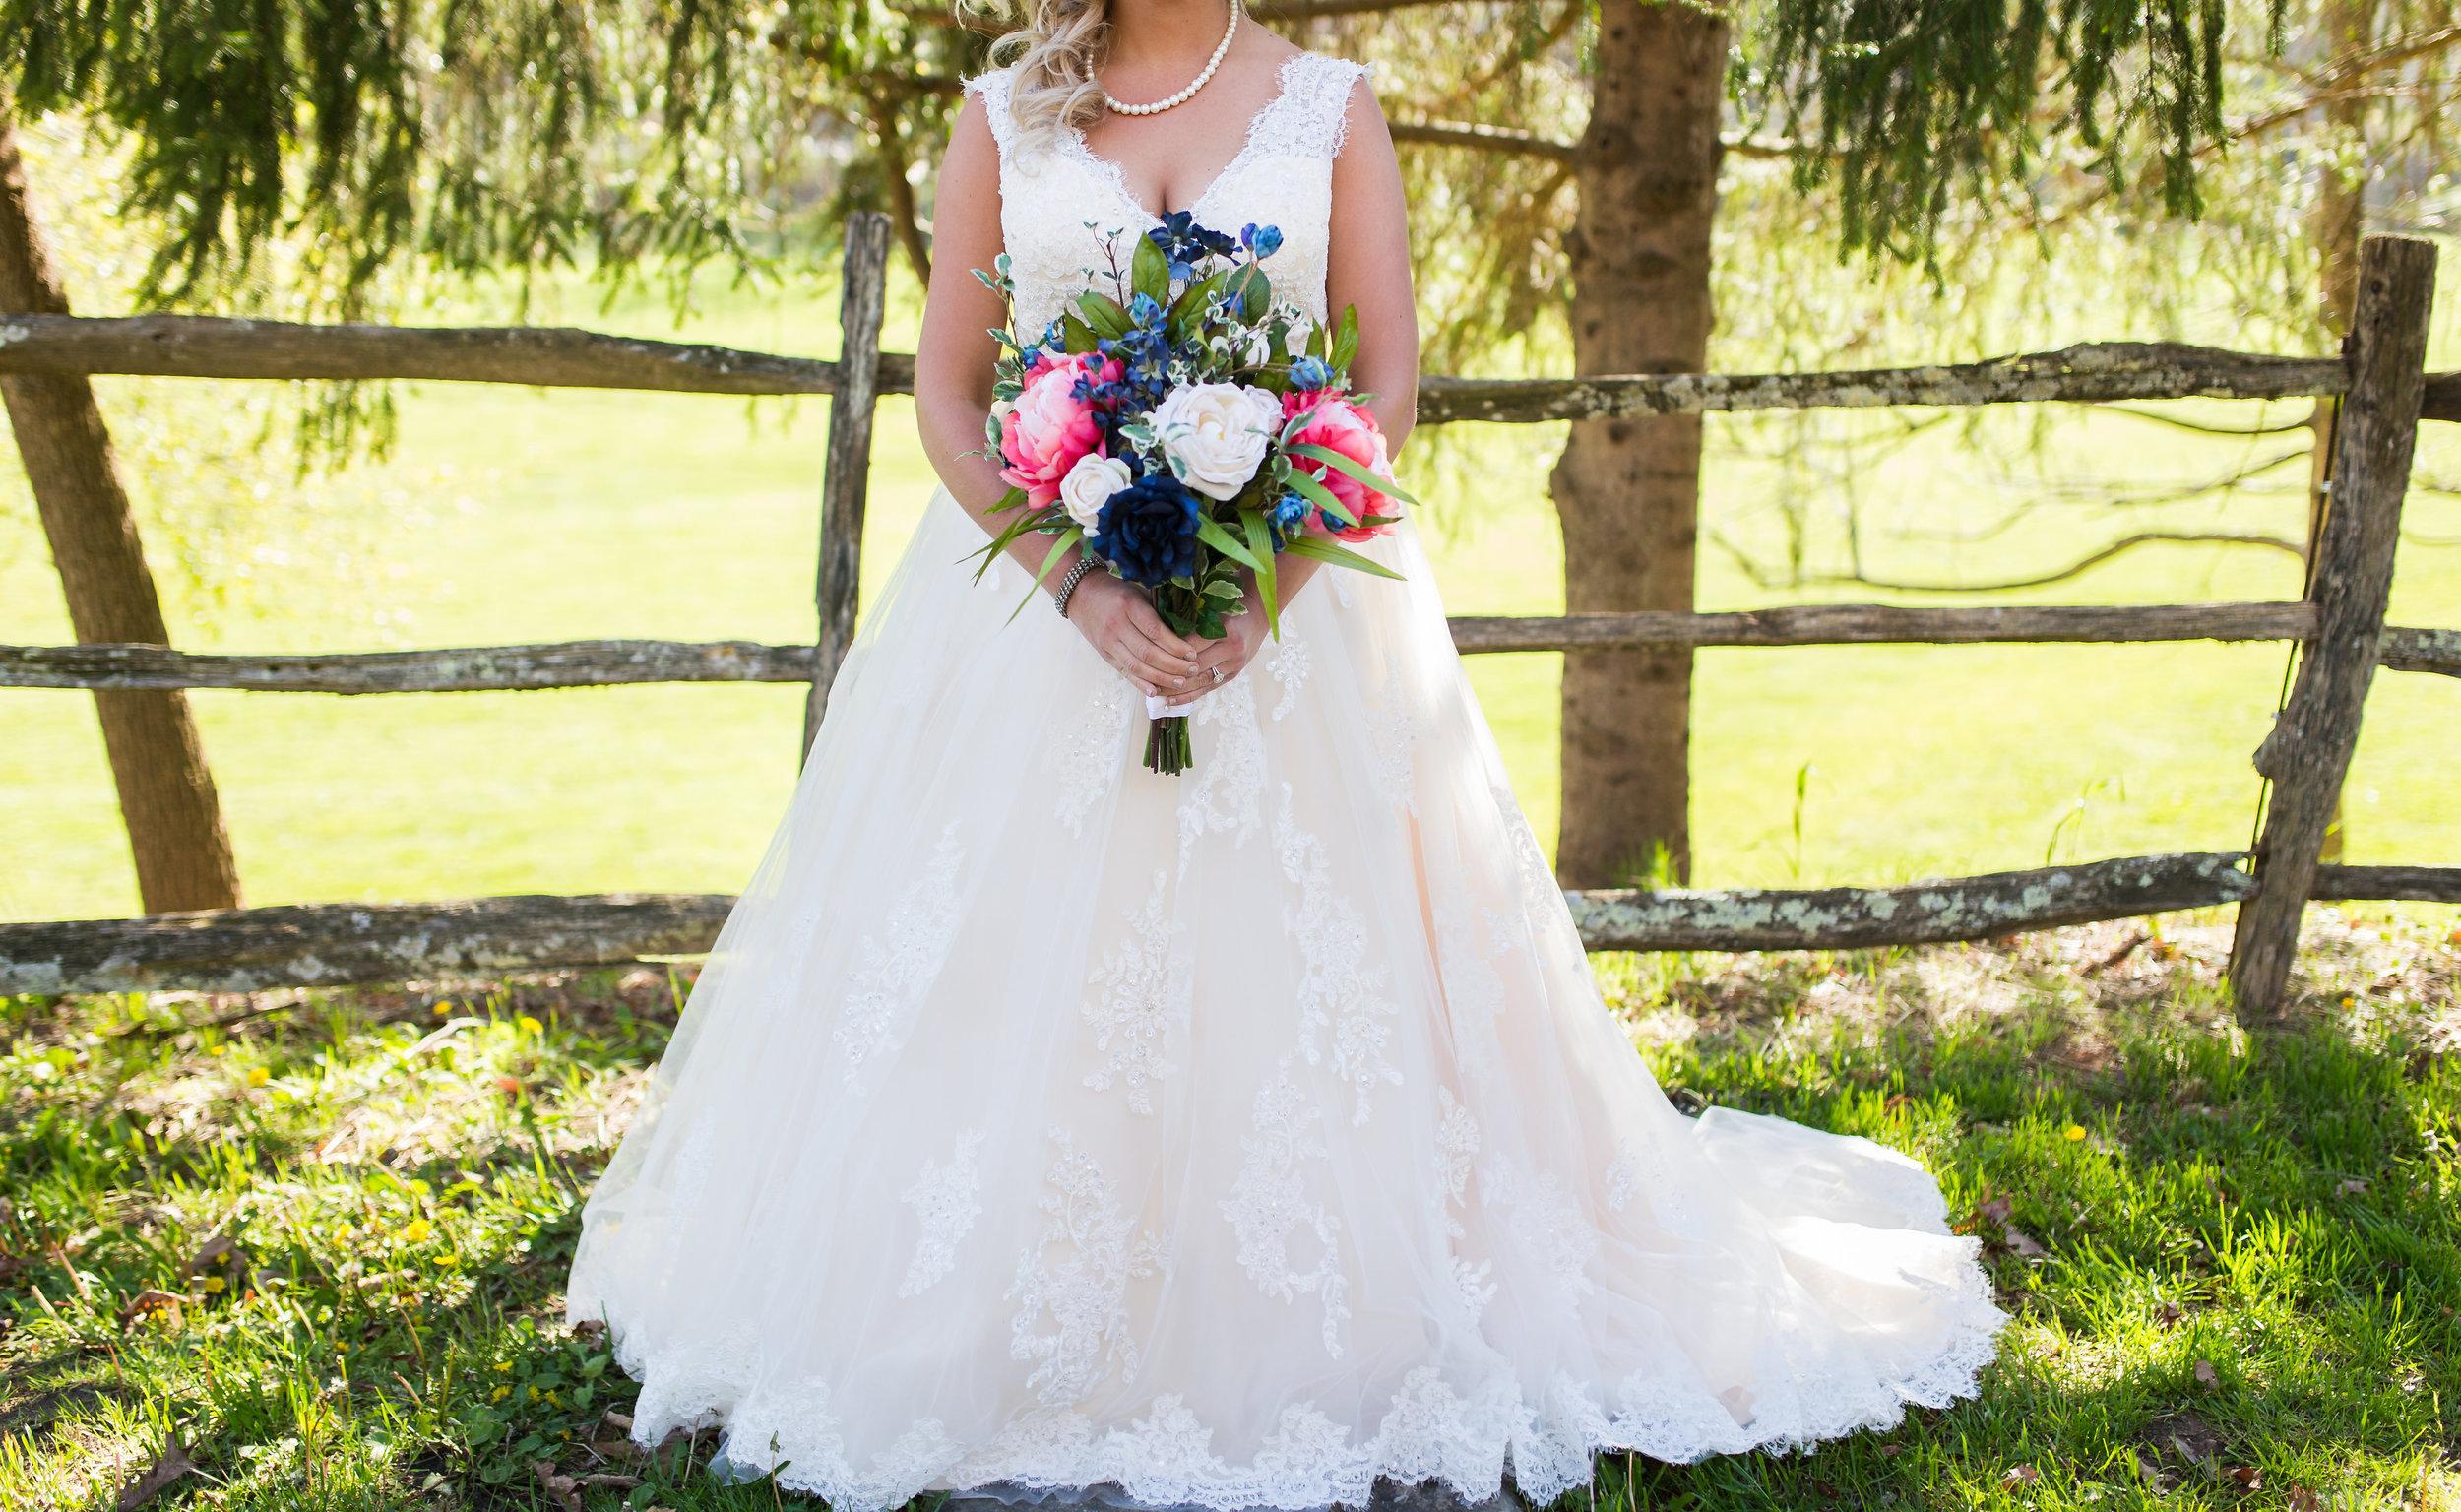 Honeysuckle-Hill-Asheville-Wedding-Venue-Ann-Cordell-Bridal-11.JPG